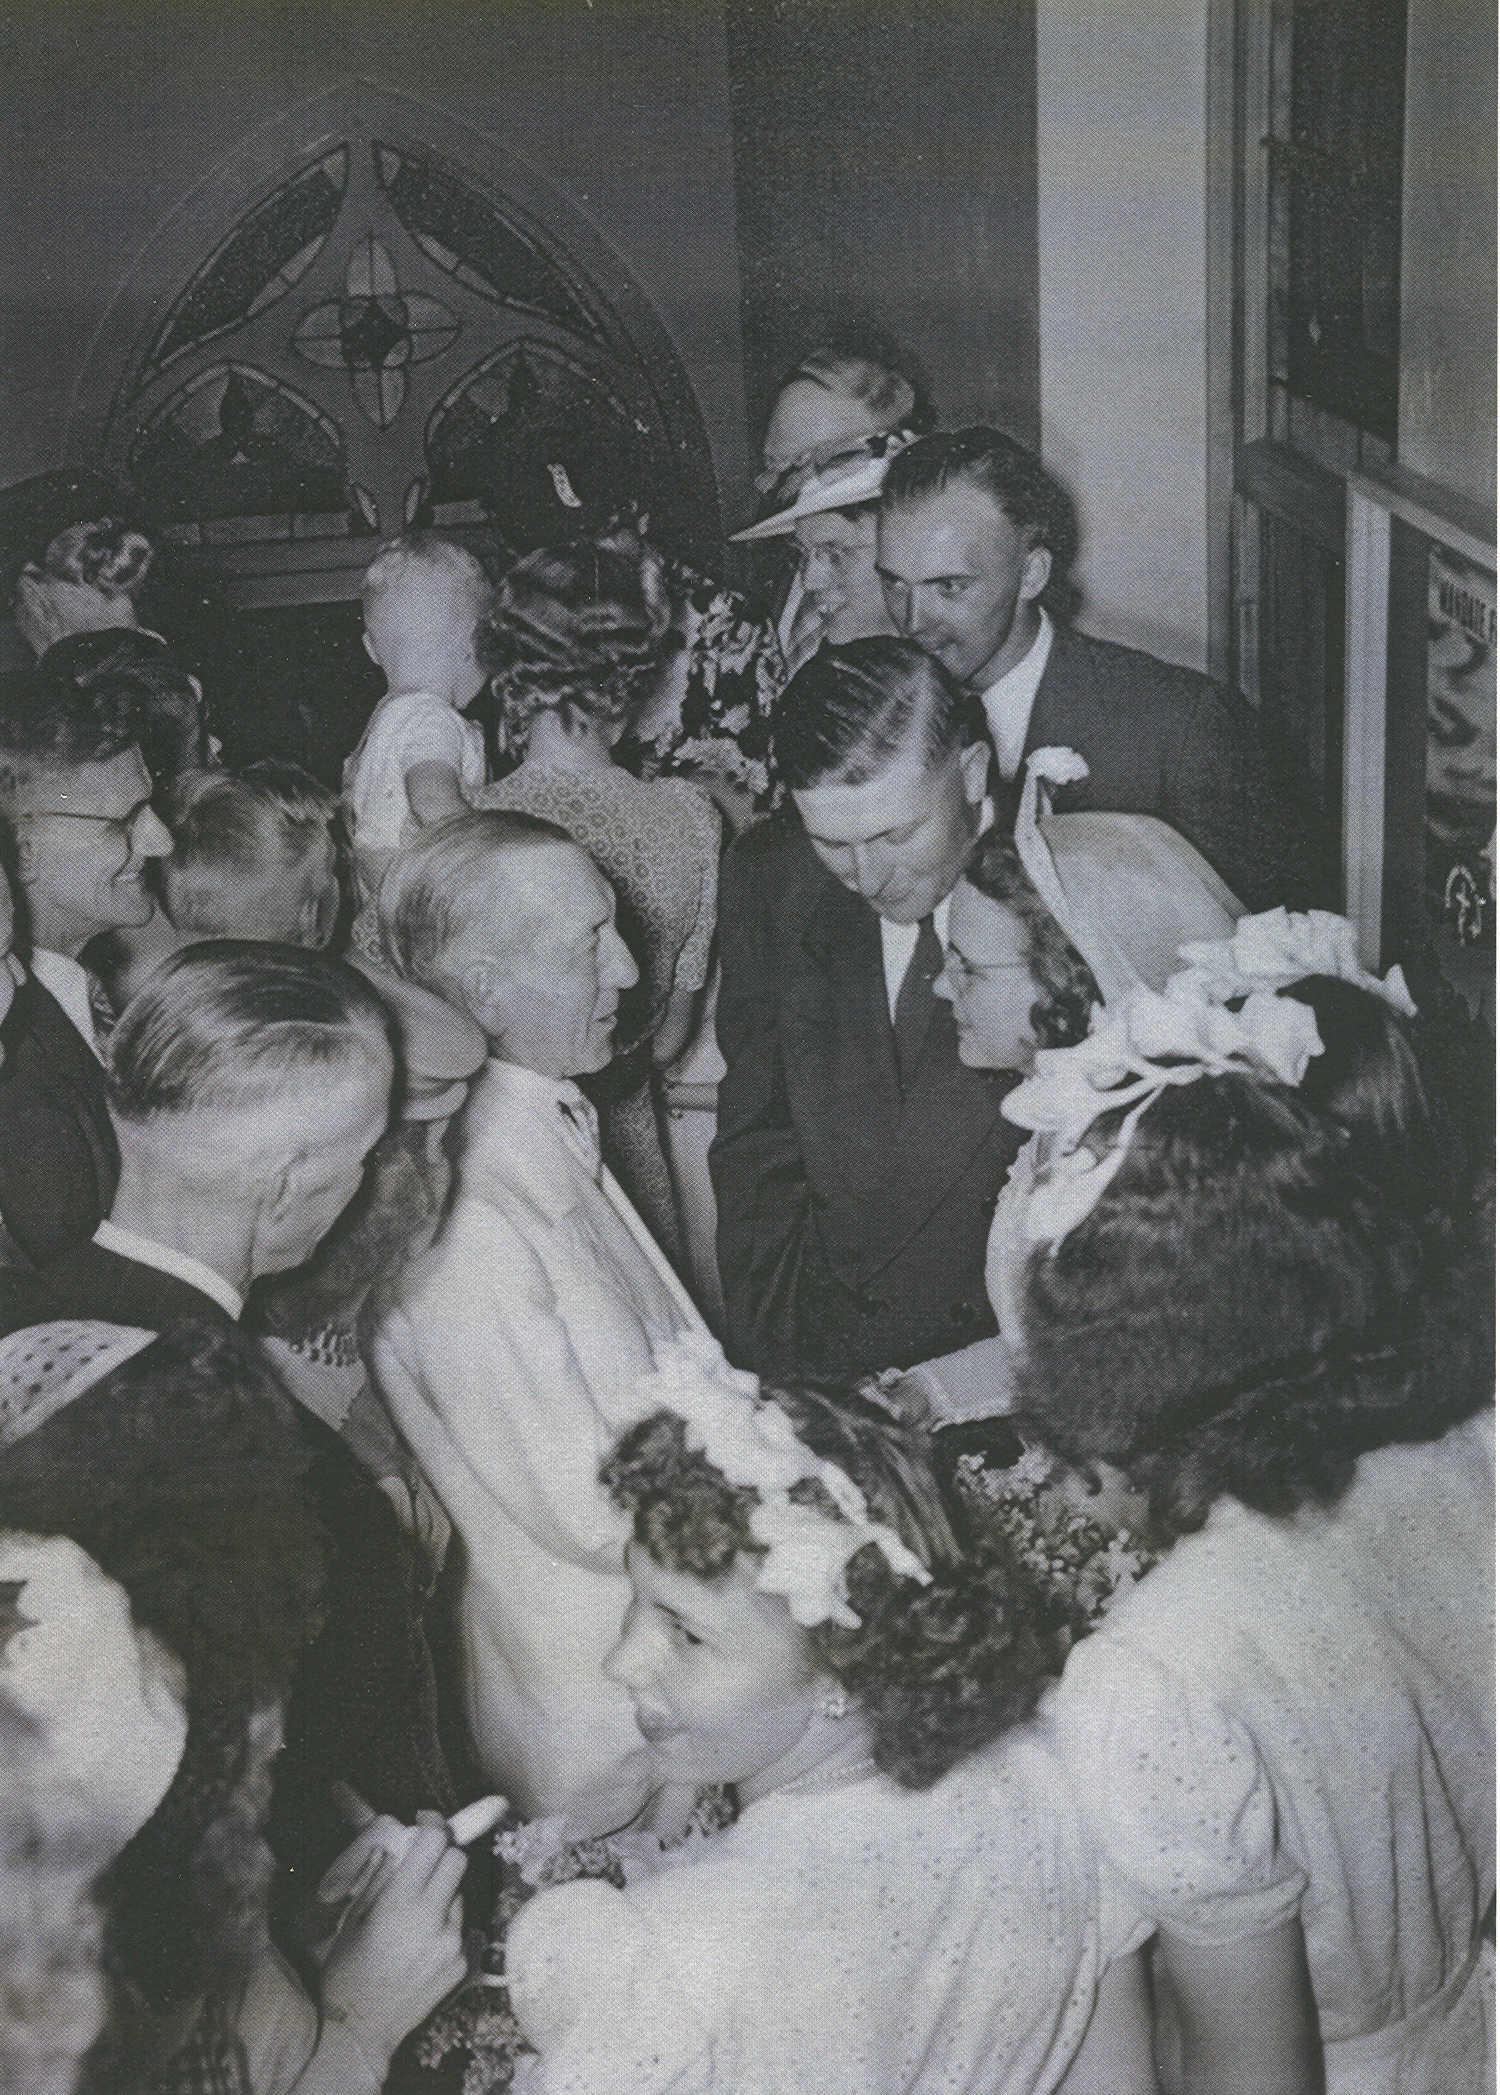 Melvin &Ruth Peterson's wedding, Mr. Baker congratulating the newlyweds.